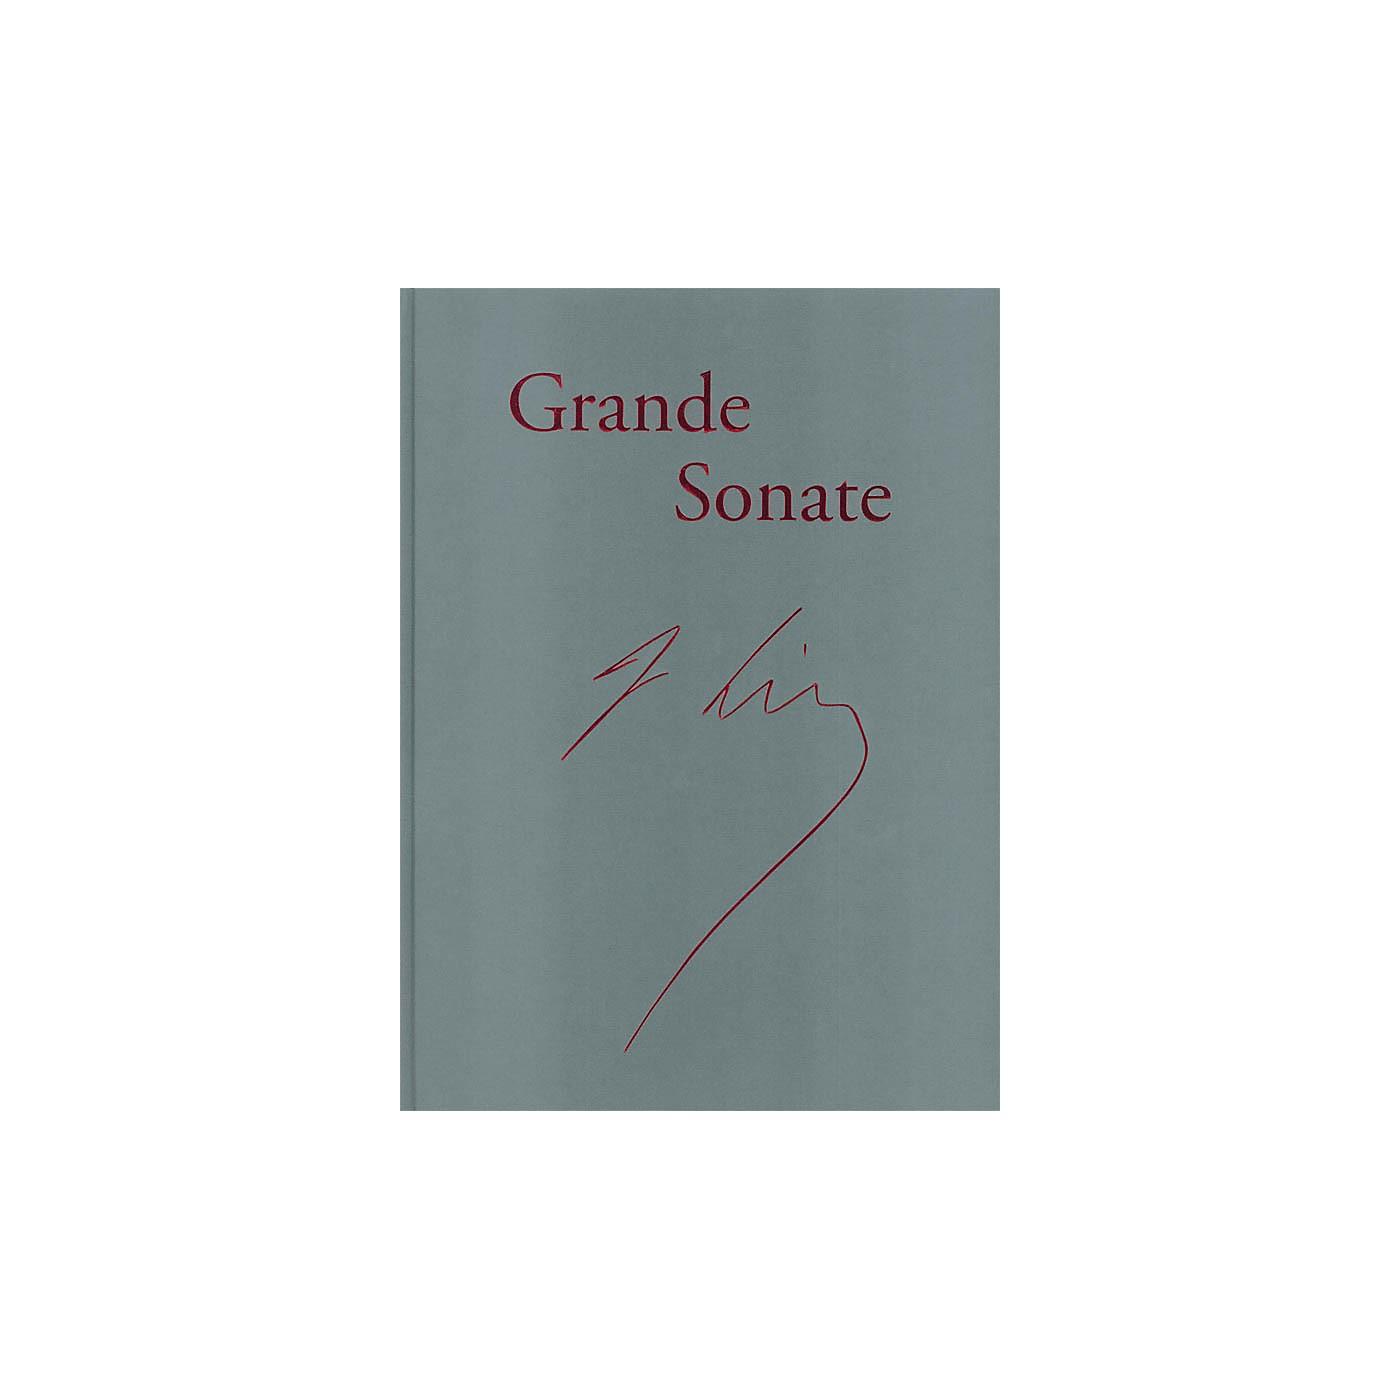 G. Henle Verlag Piano Sonata in B minor ('Grande Sonate' - Revised Edition) Henle Facsimile Series Hardcover thumbnail